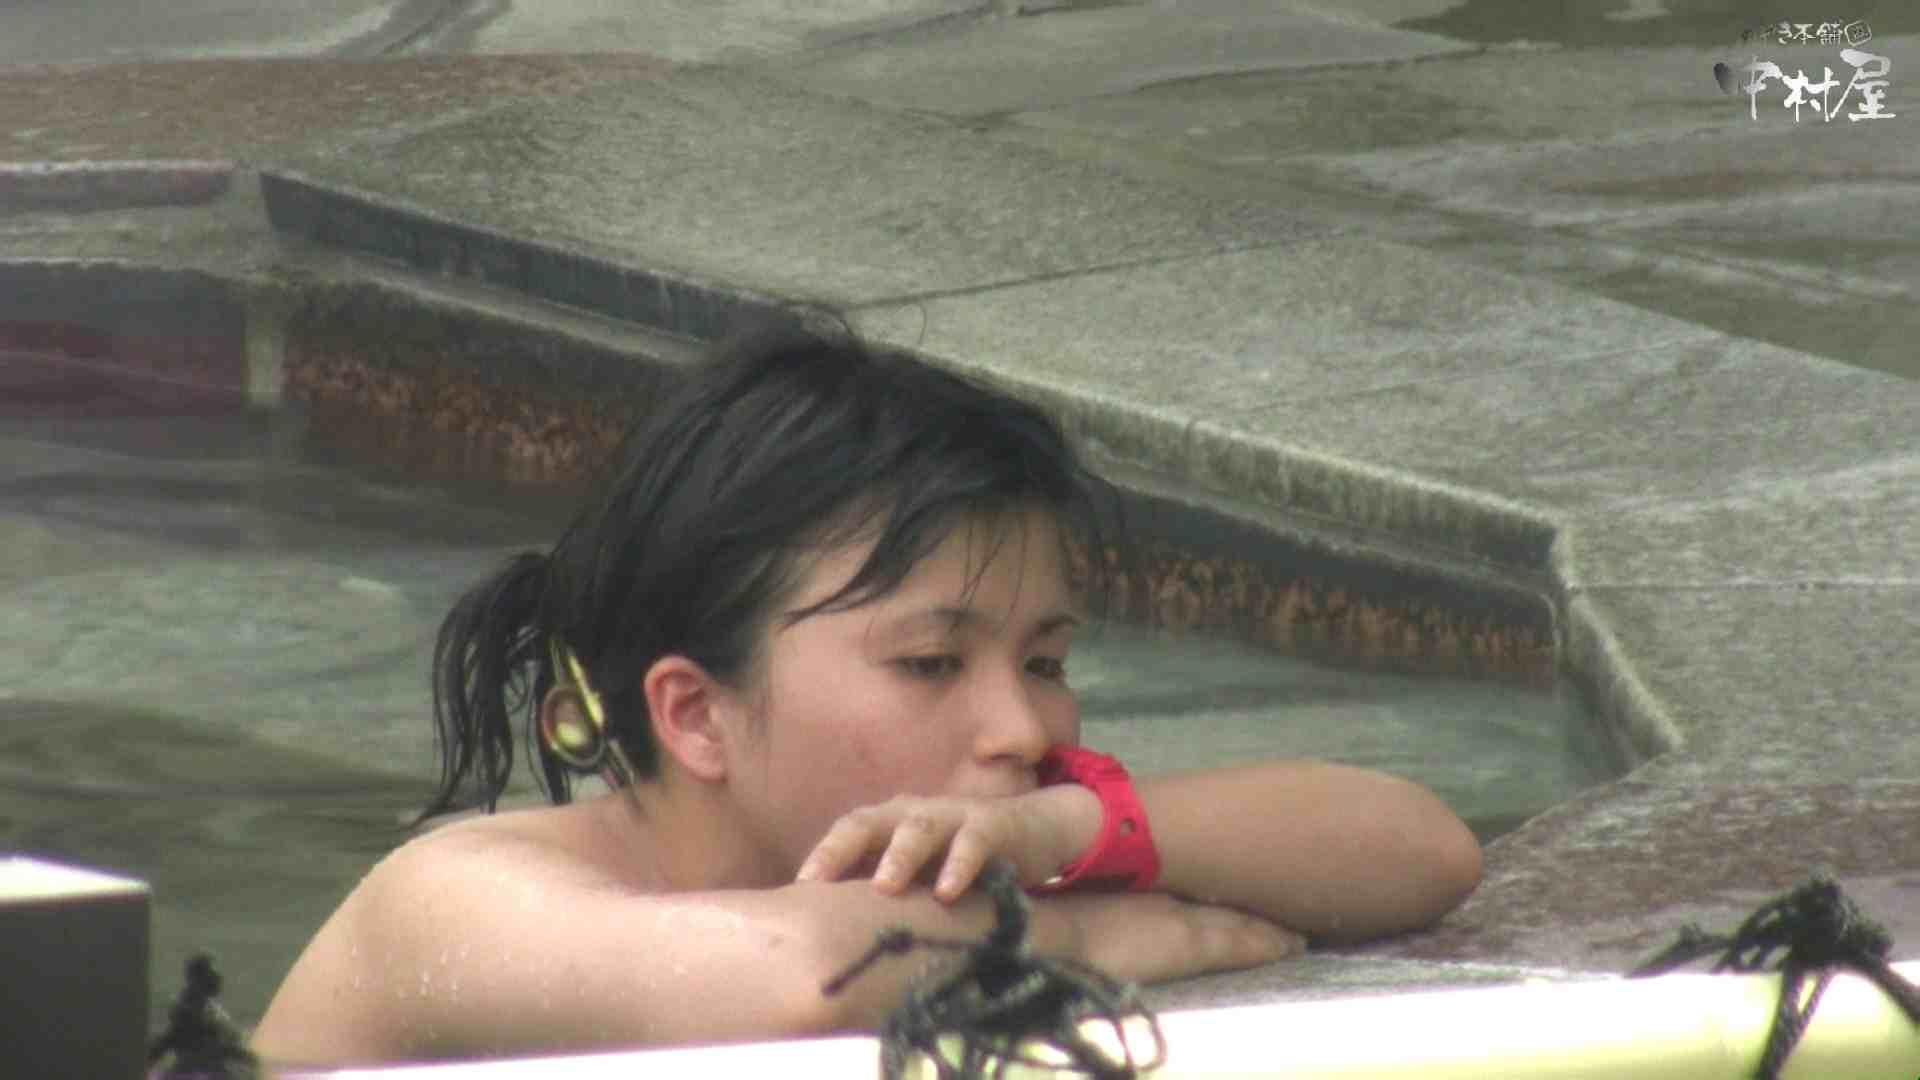 Aquaな露天風呂Vol.894 盗撮師作品 セックス画像 93pic 83